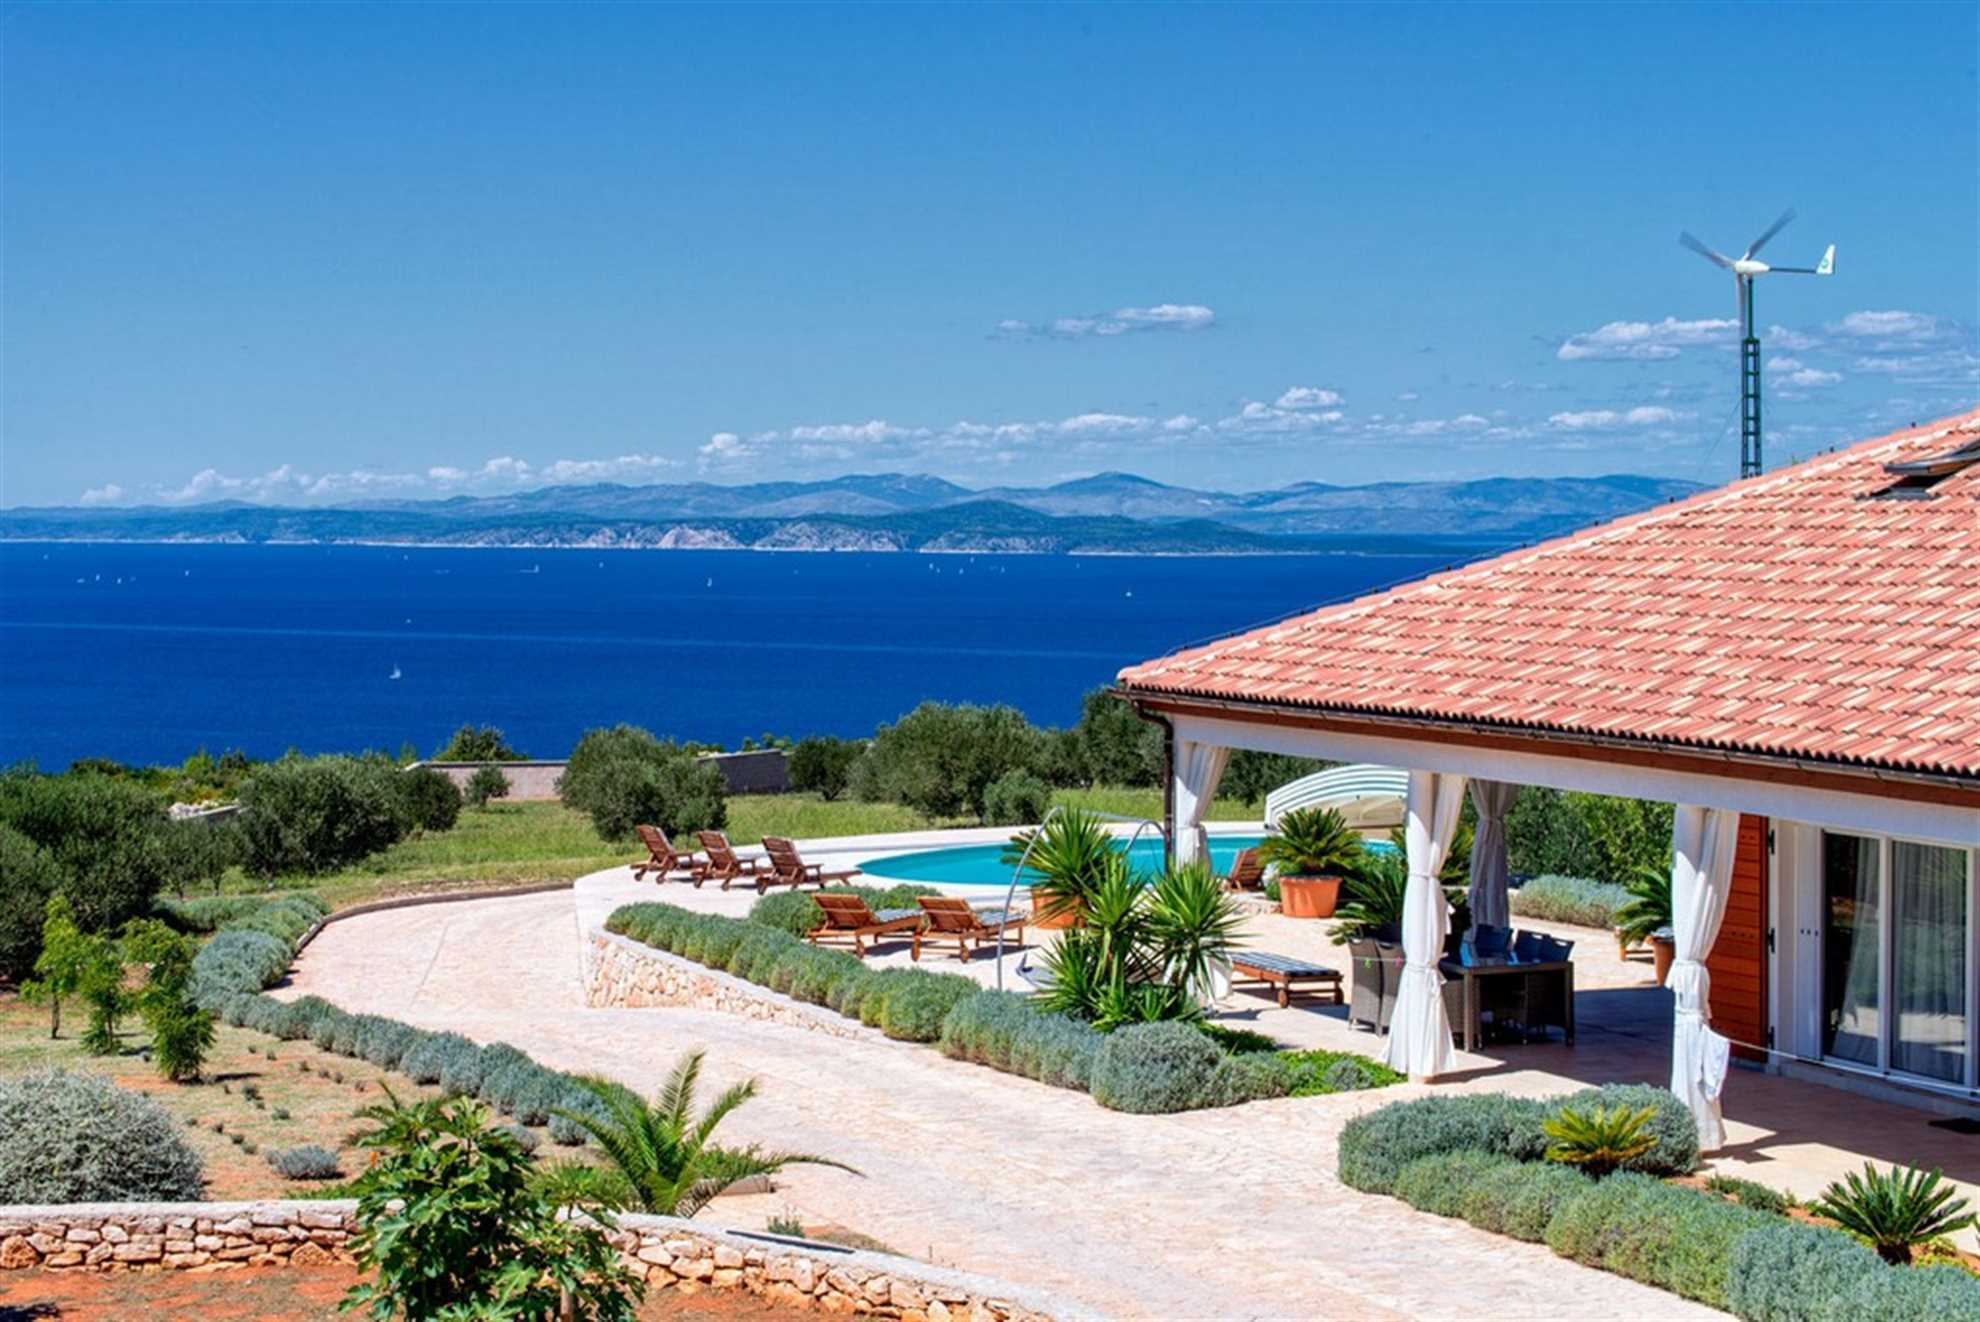 Villa Golden Olive with Swimming Pool on Hvar island